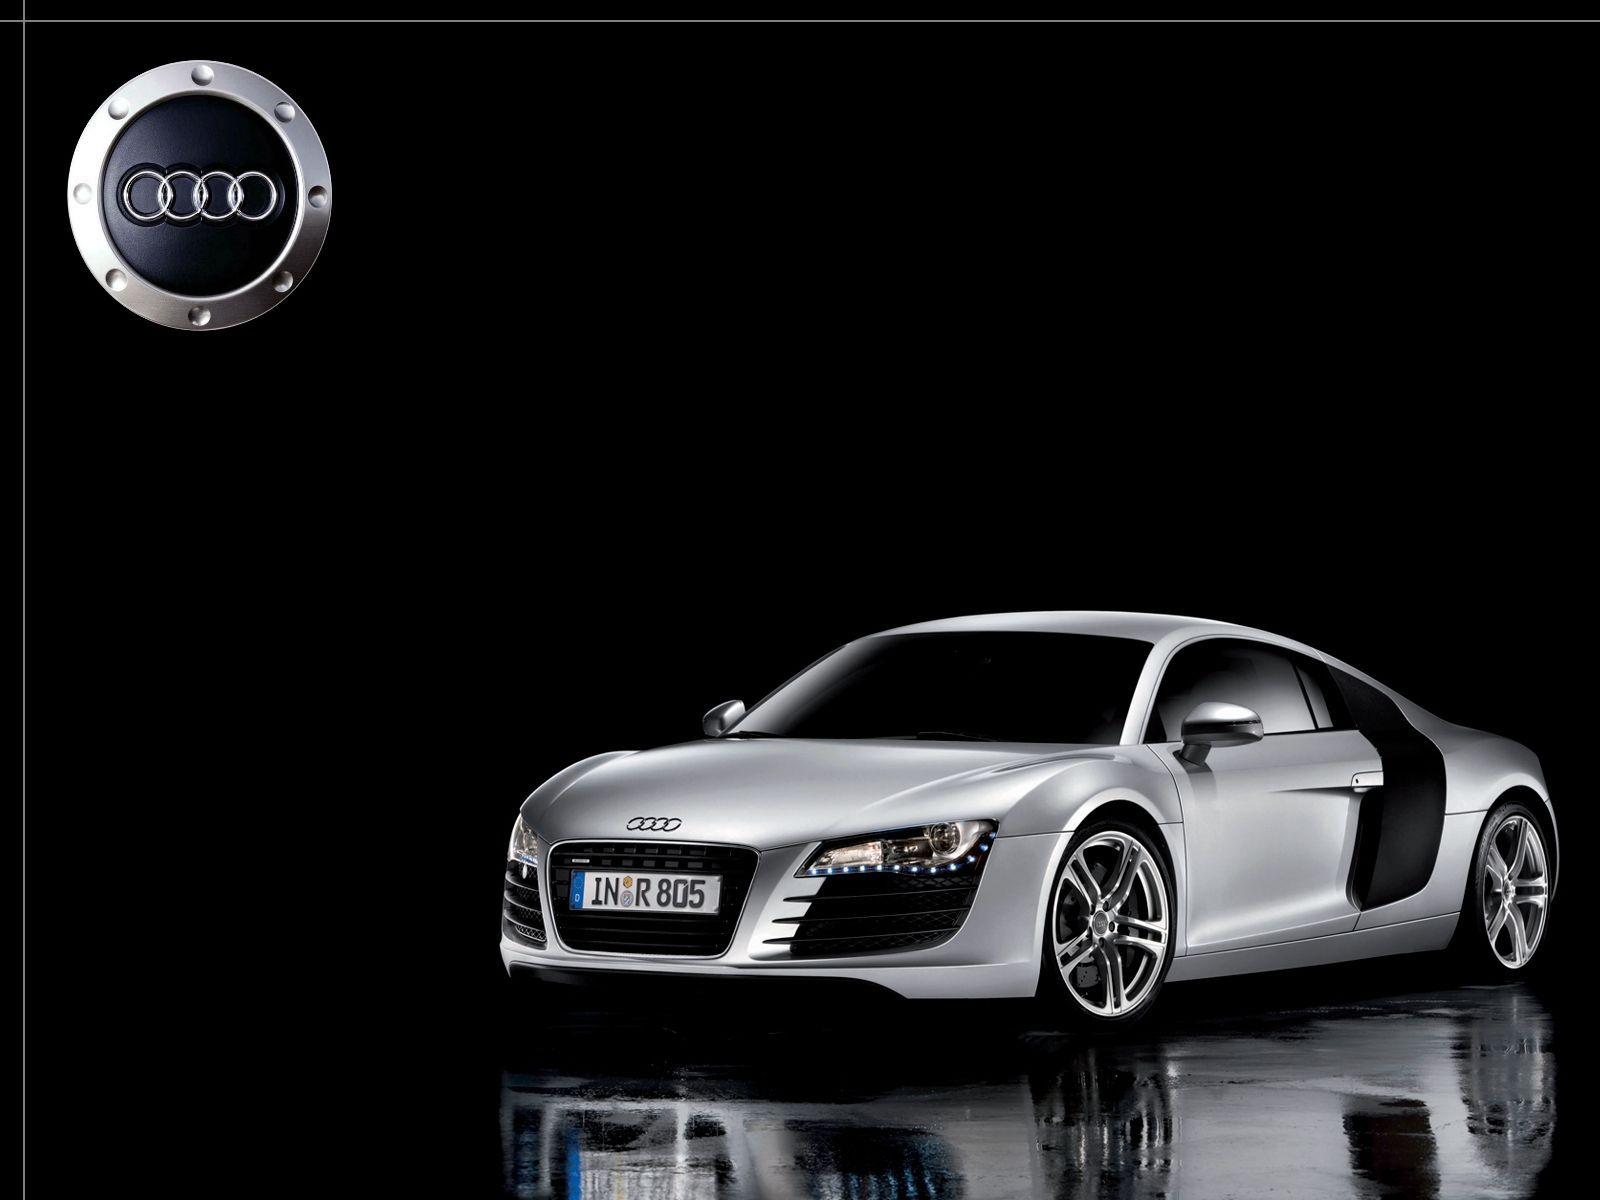 Audi R Gold Wallpaper Audi Cars Wallpapers In Jpg Format For Free